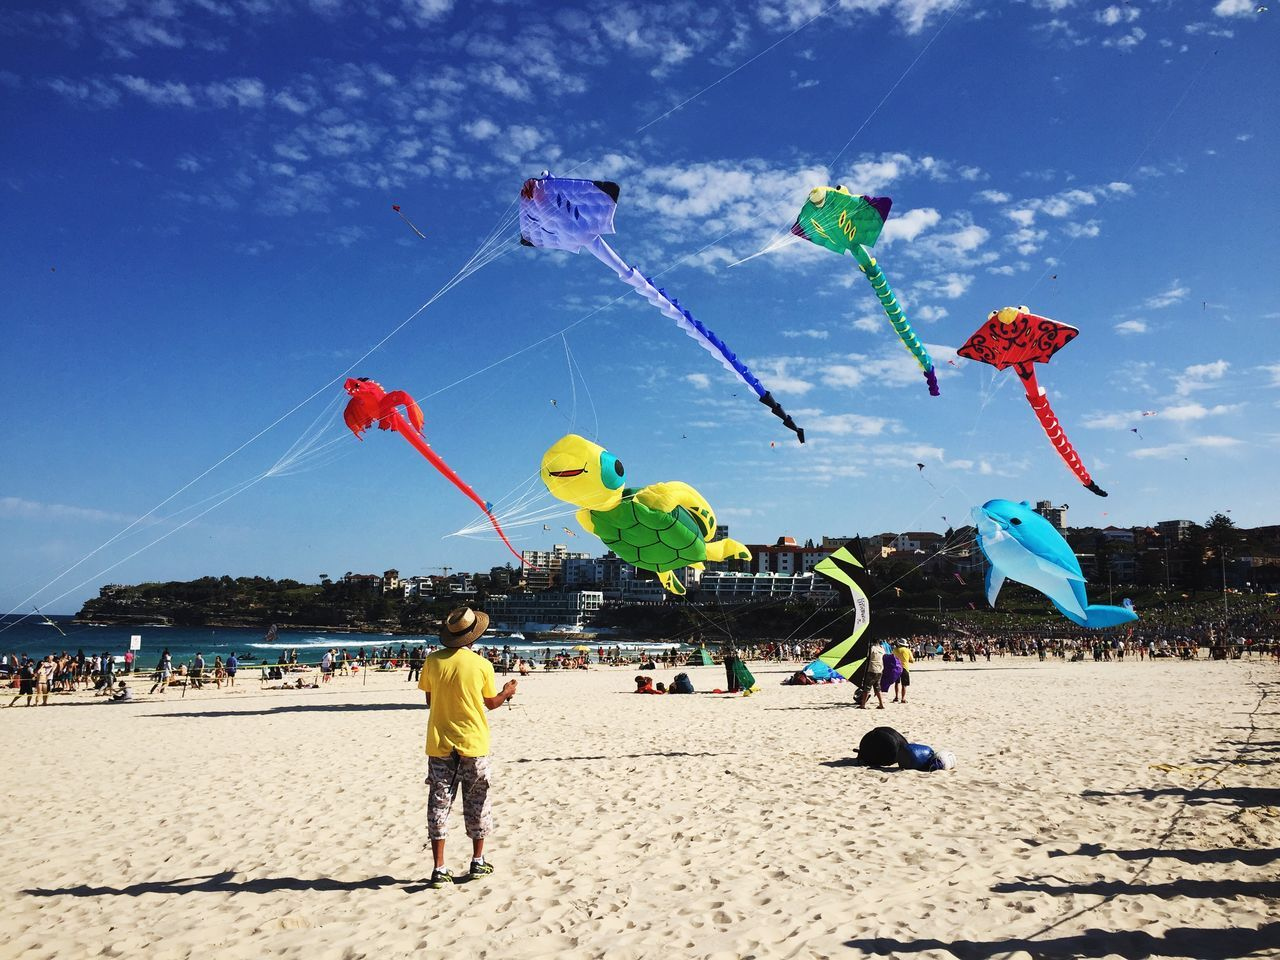 Watch them fly!   Enjoying The Sun Relaxing Kite IPhoneography Vscocam EyeEm Best Shots EyeEmBestPics Beach Bondi Beach Colors Of Carnival